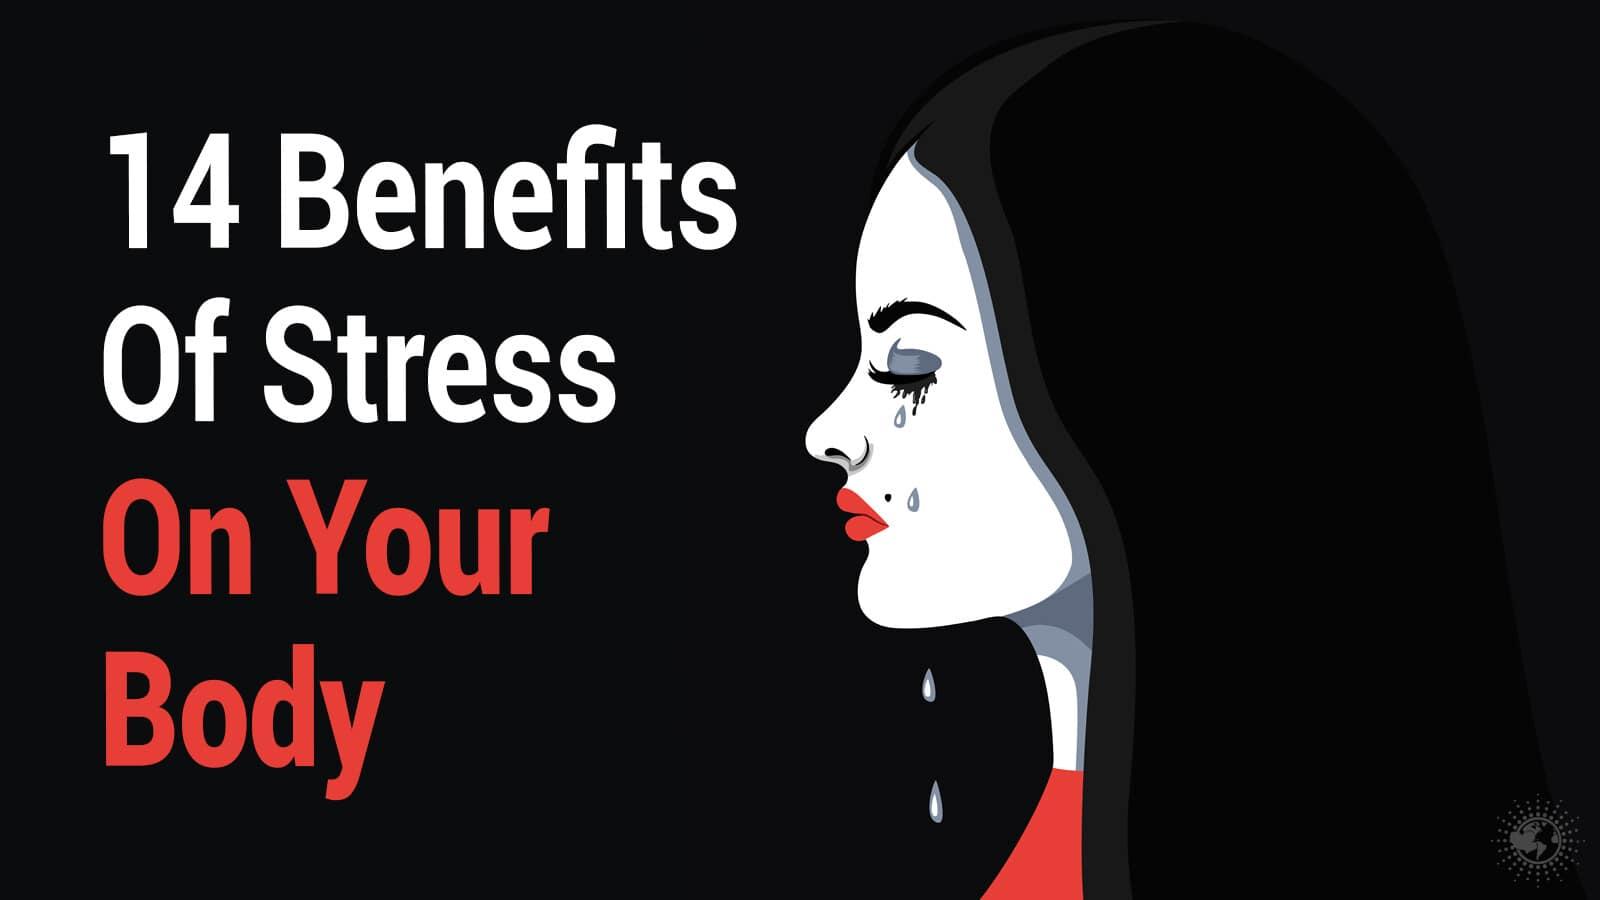 stress benefits